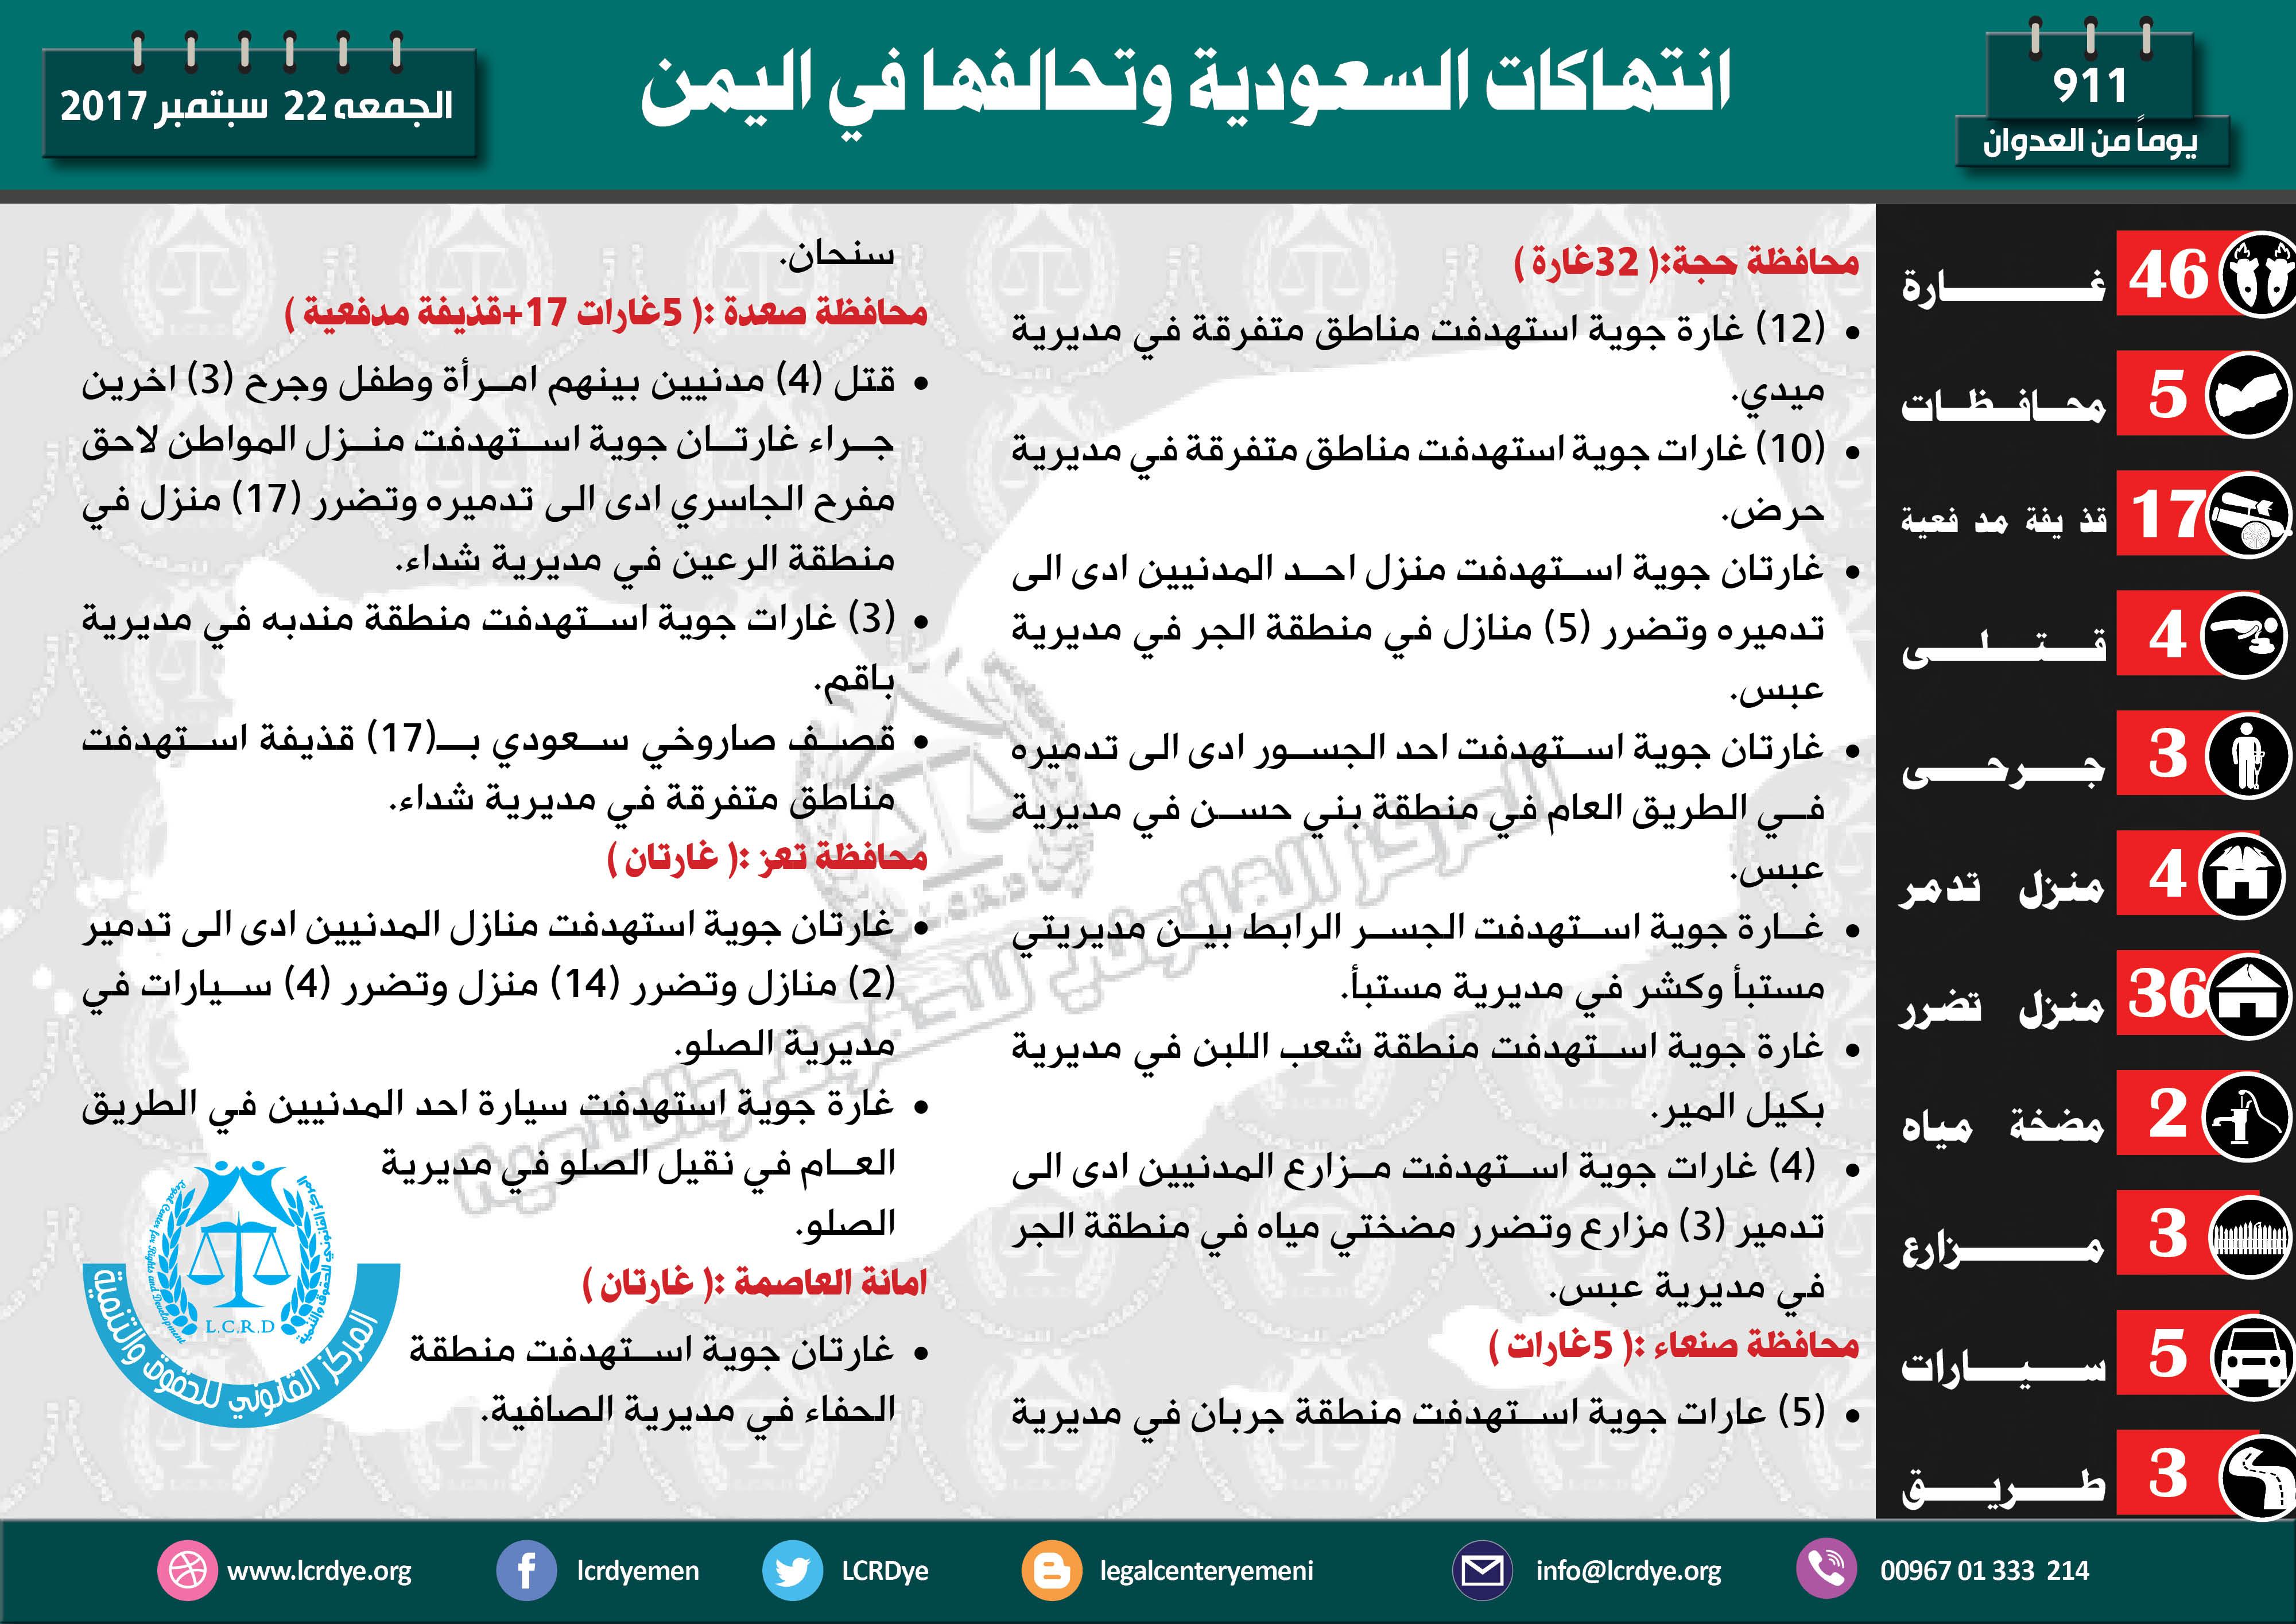 انفوجرافيك عربي22 سبتمبر